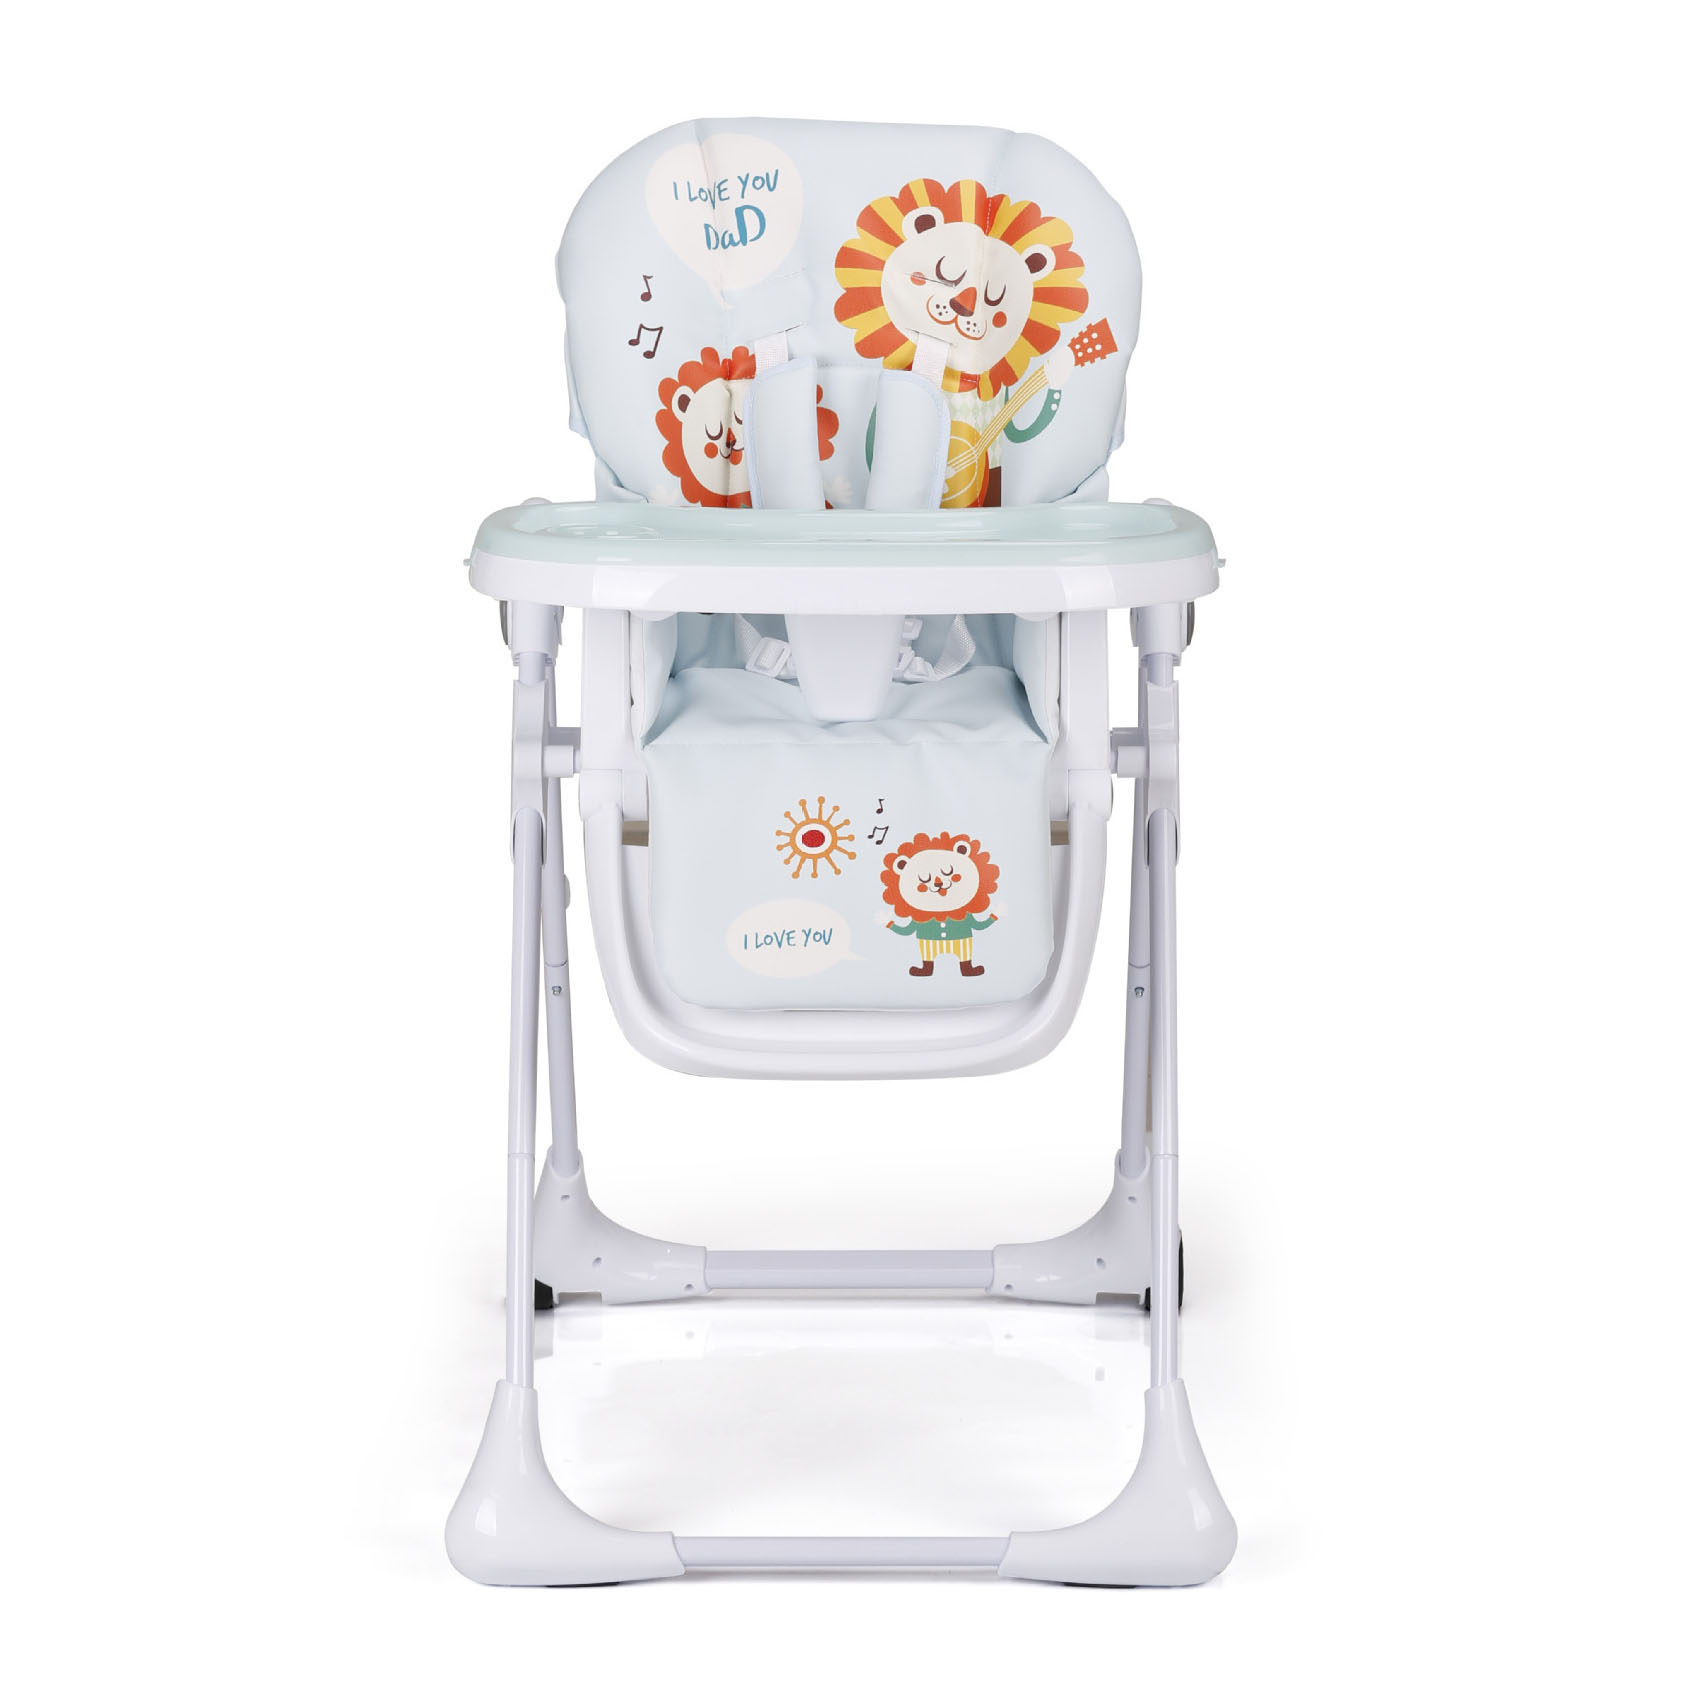 Harari Baby Array image123